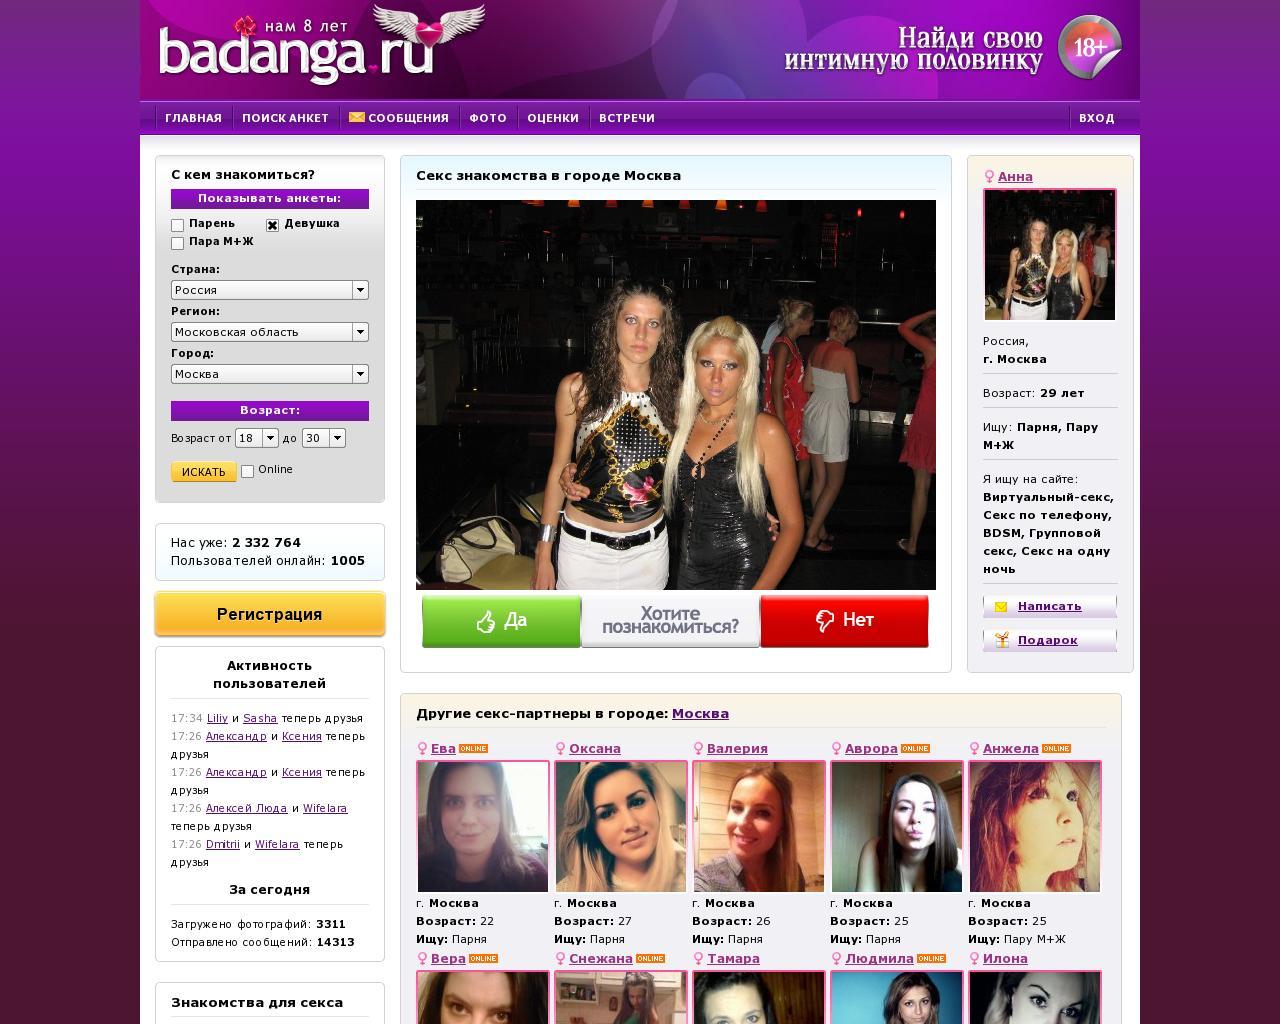 Сайт для секса безплатно